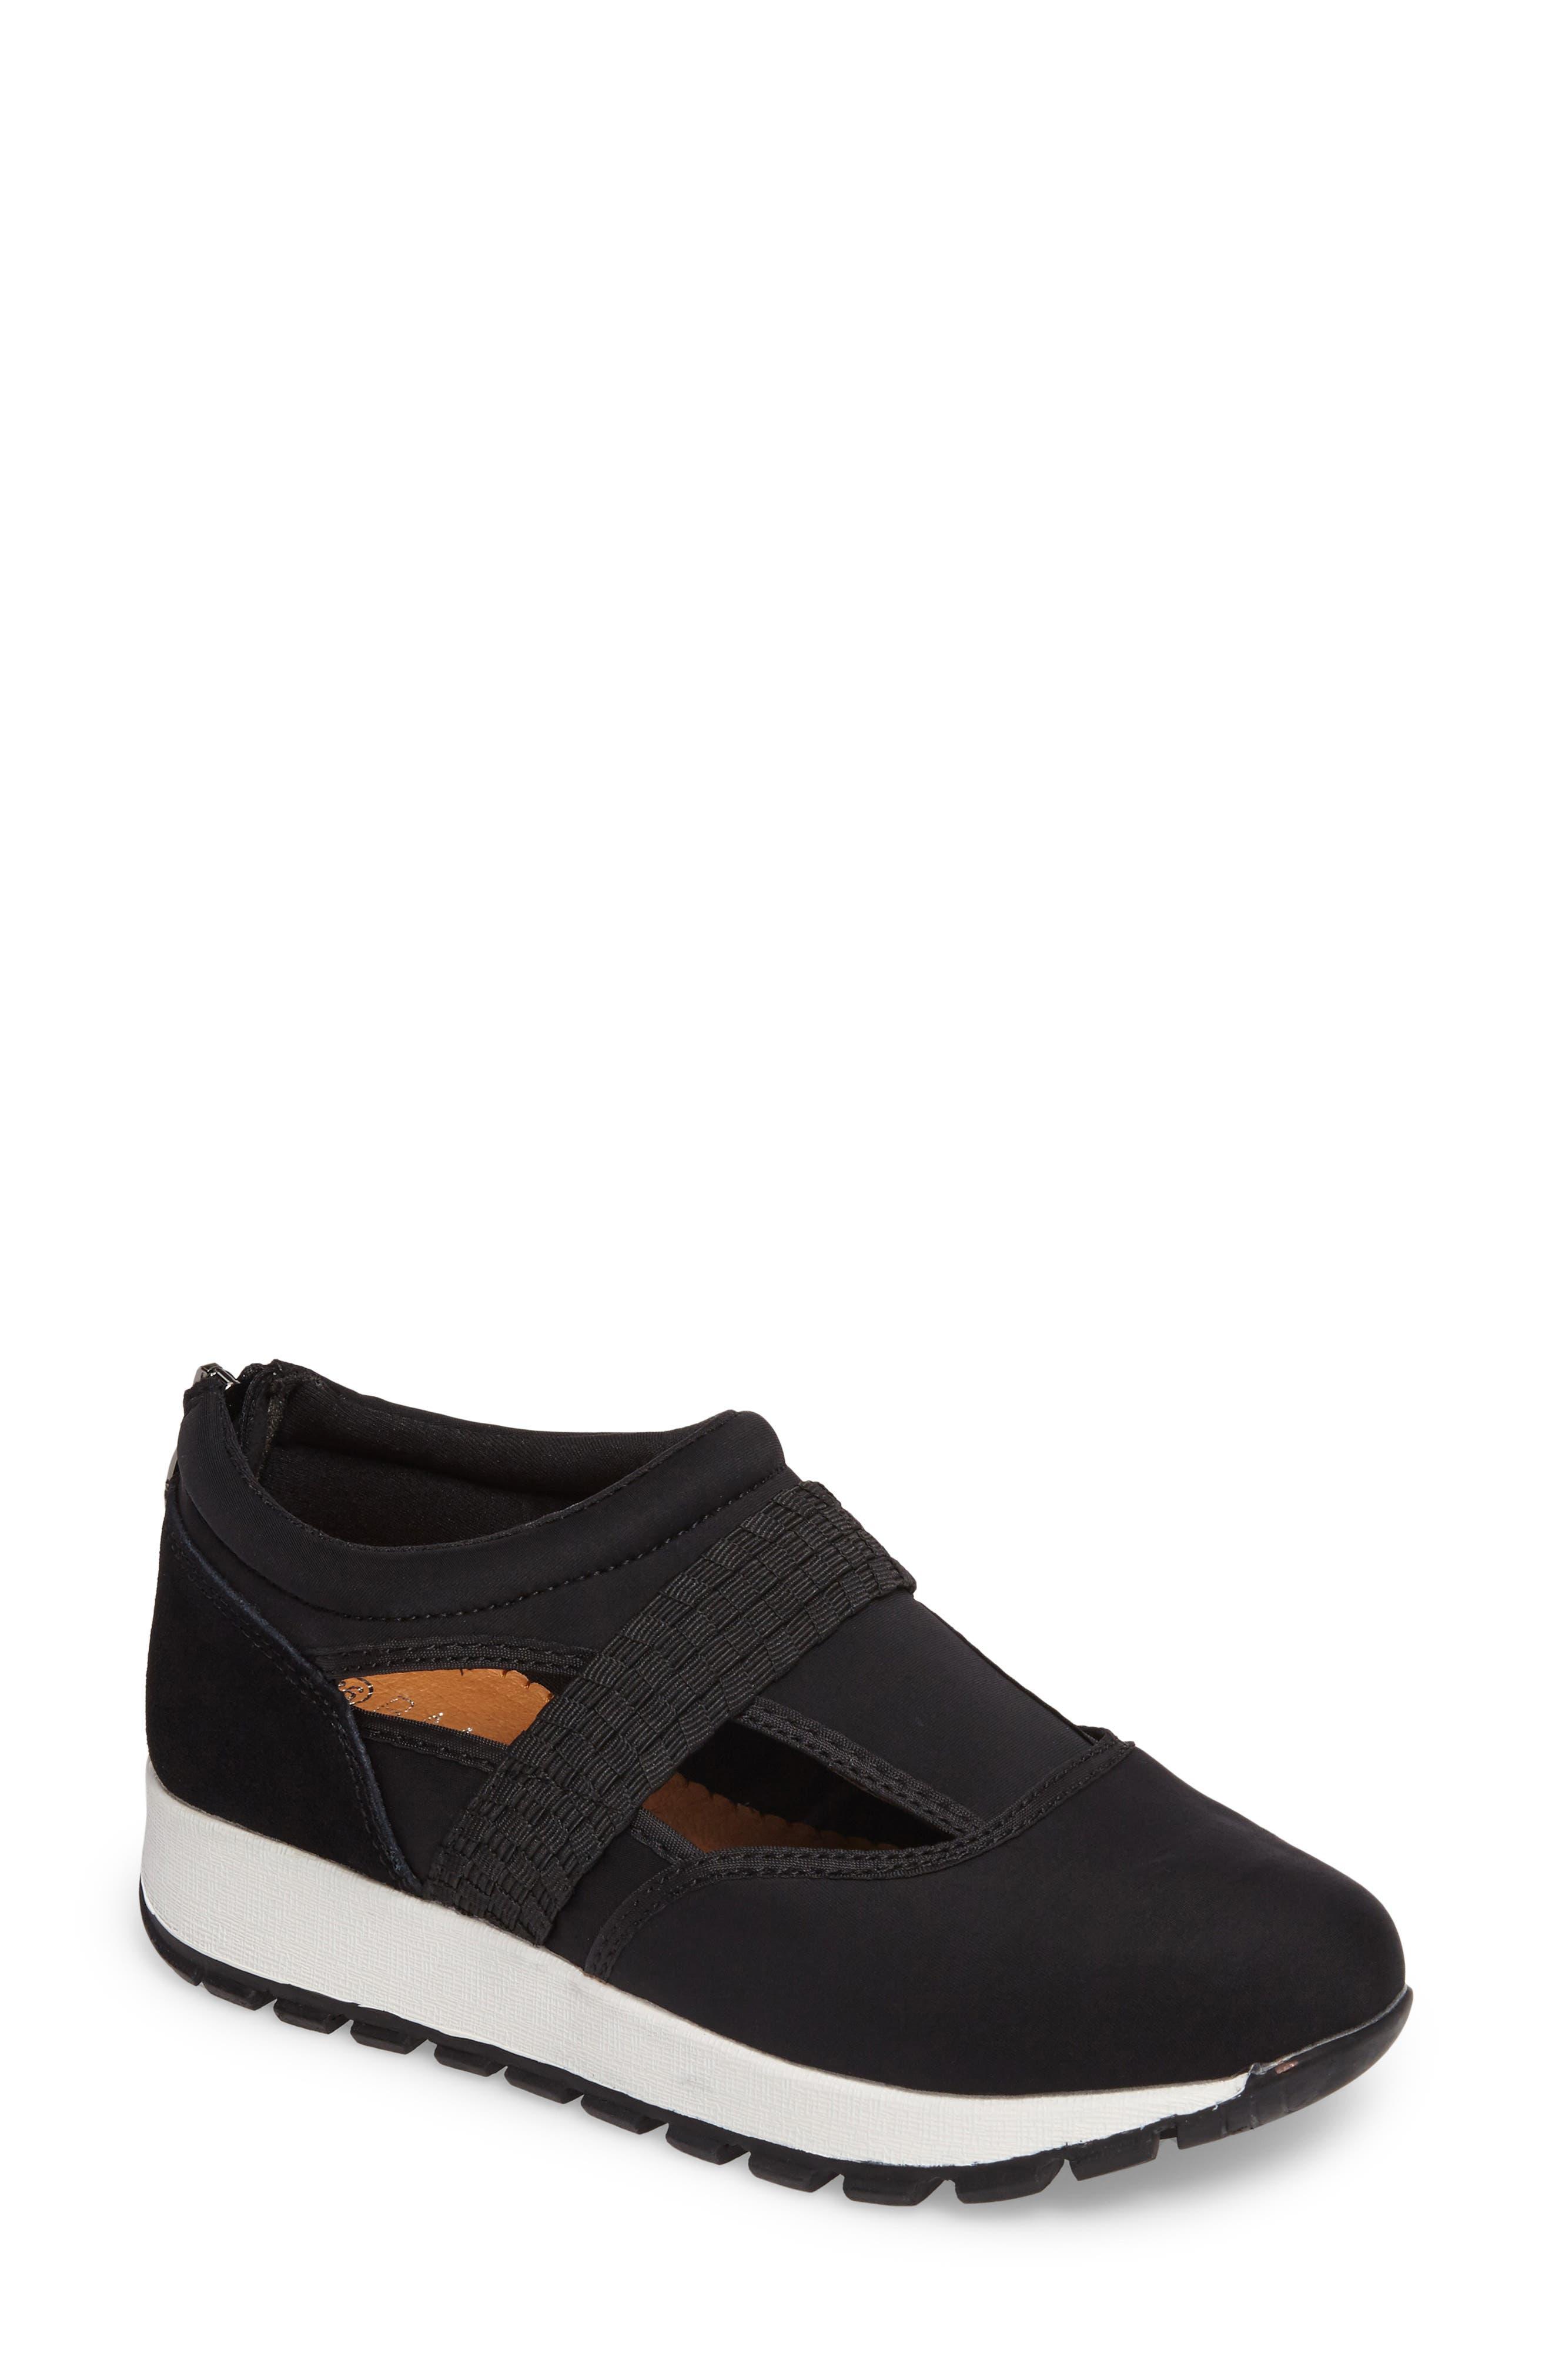 Bernie Mev Janelle Sneaker,                             Main thumbnail 1, color,                             BLACK FABRIC